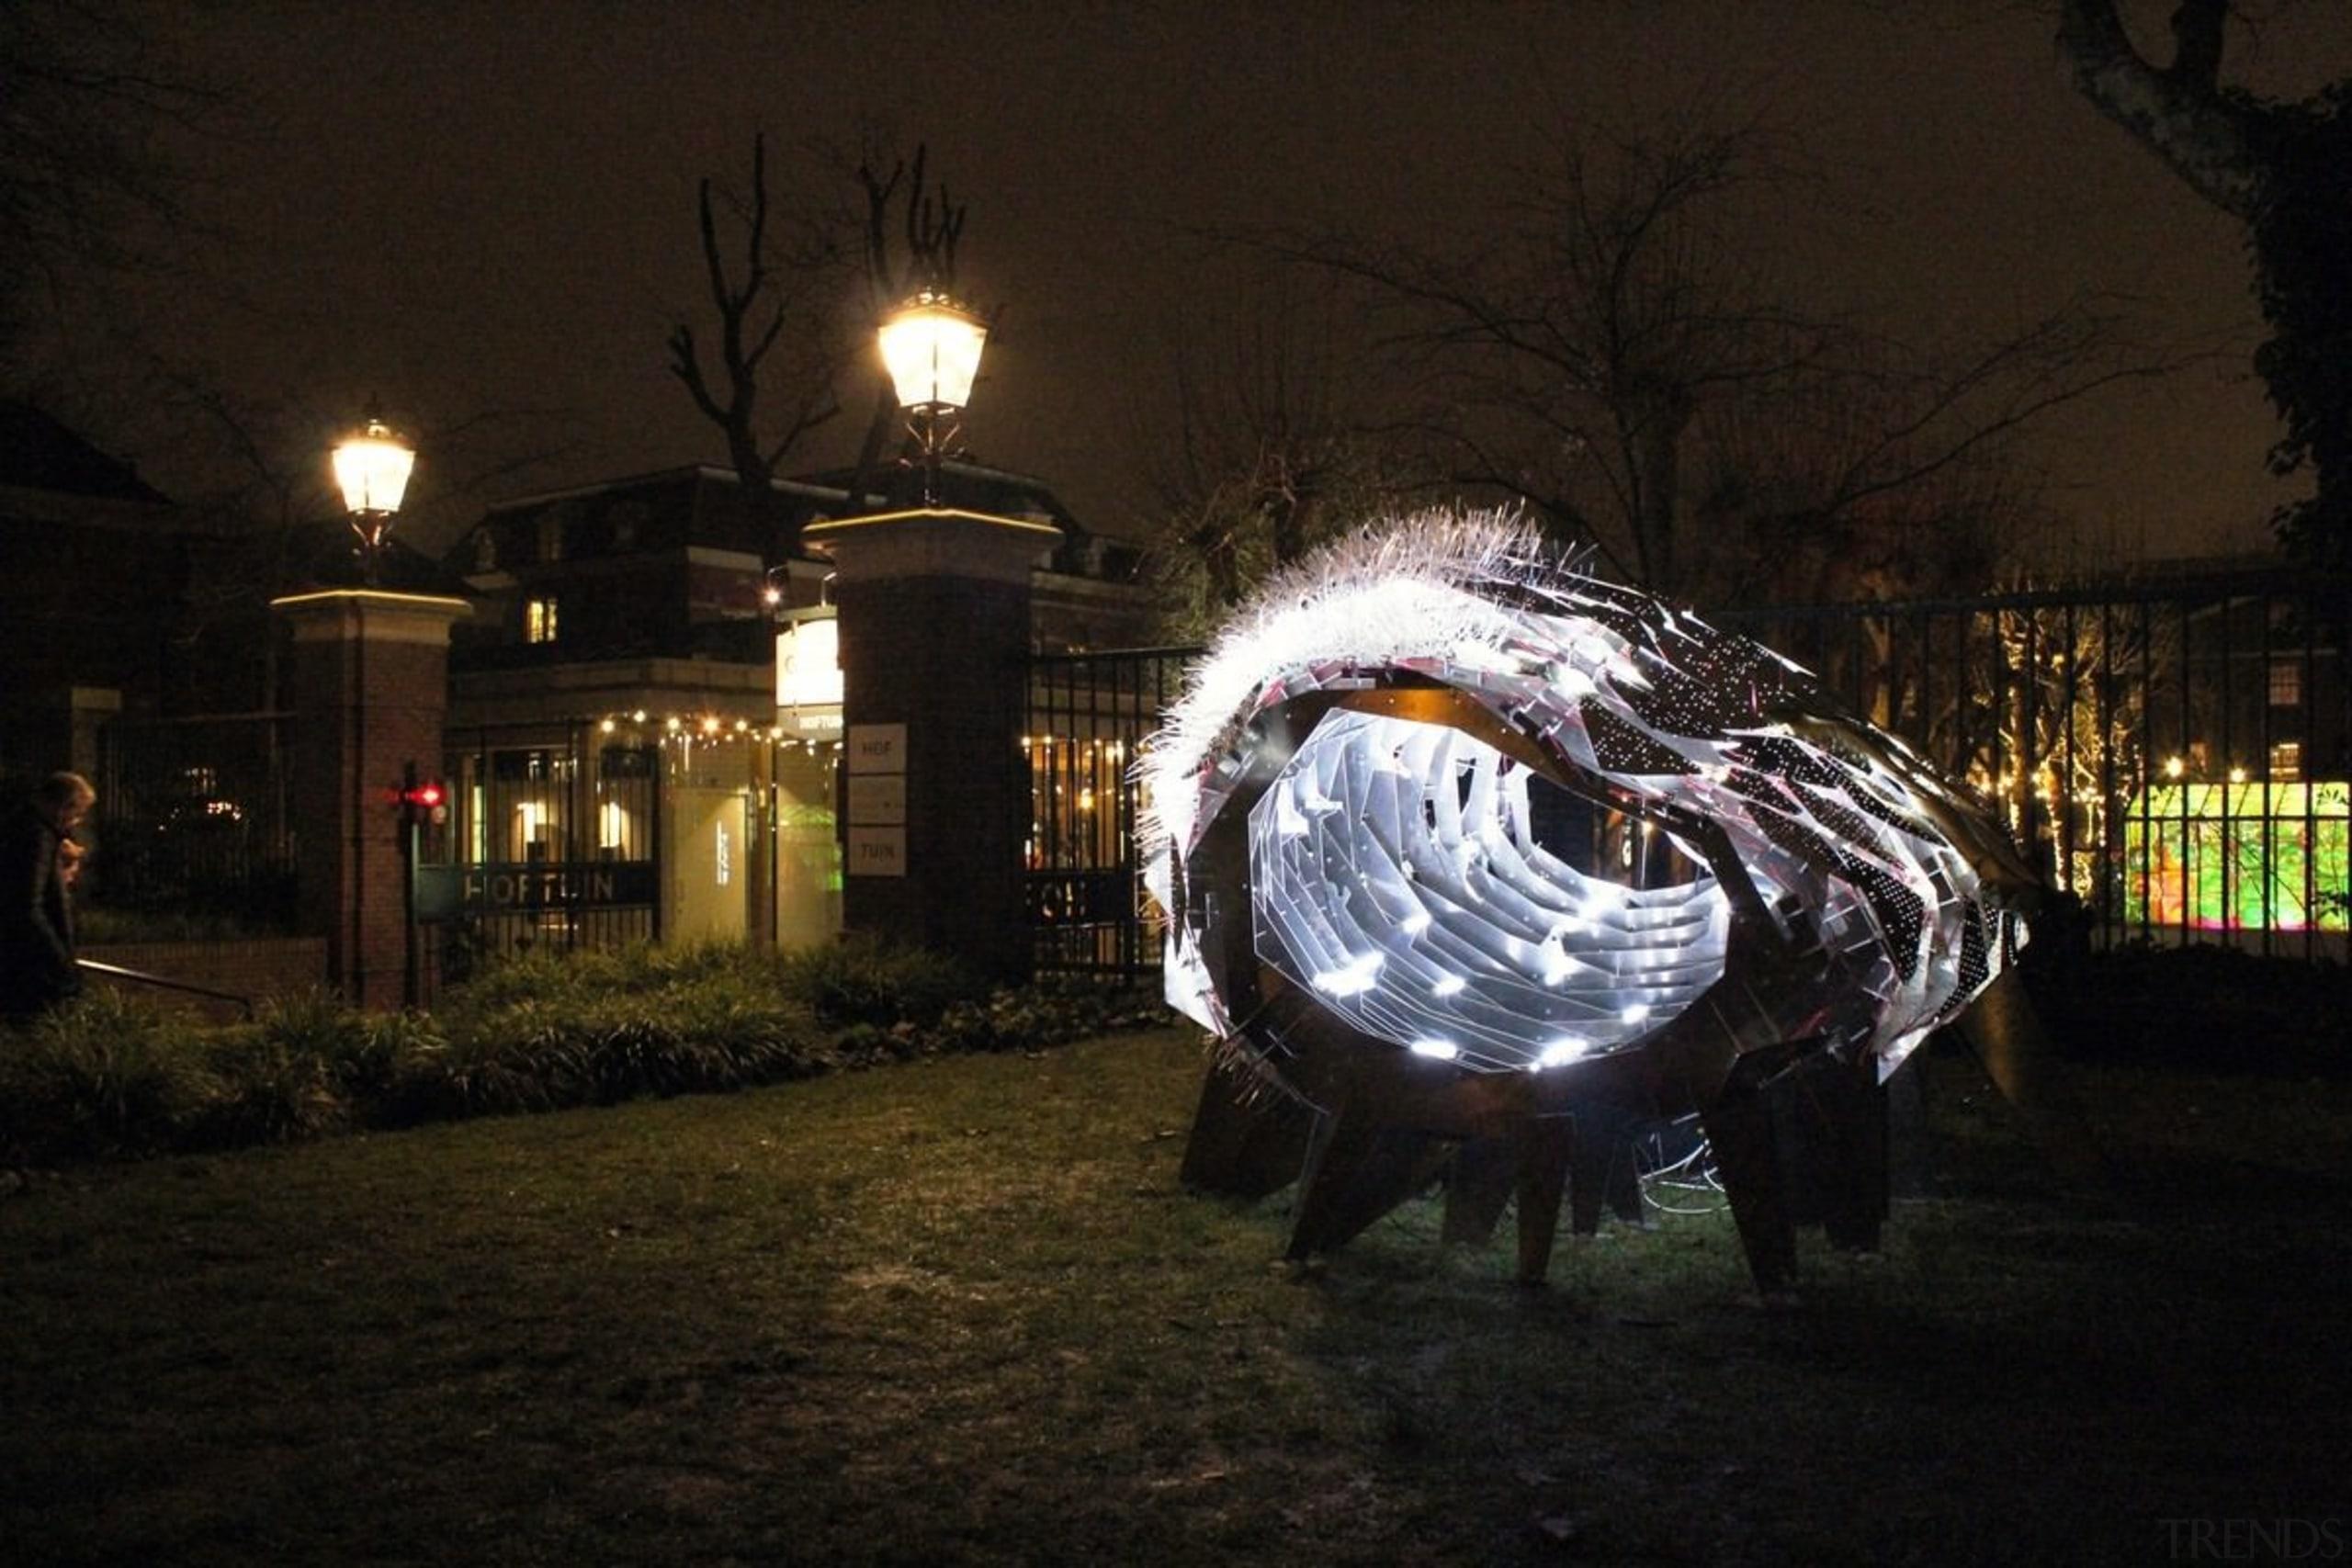 The Flowering Phantasm by Clay Odom - The darkness, evening, light, lighting, night, sky, street light, tree, black